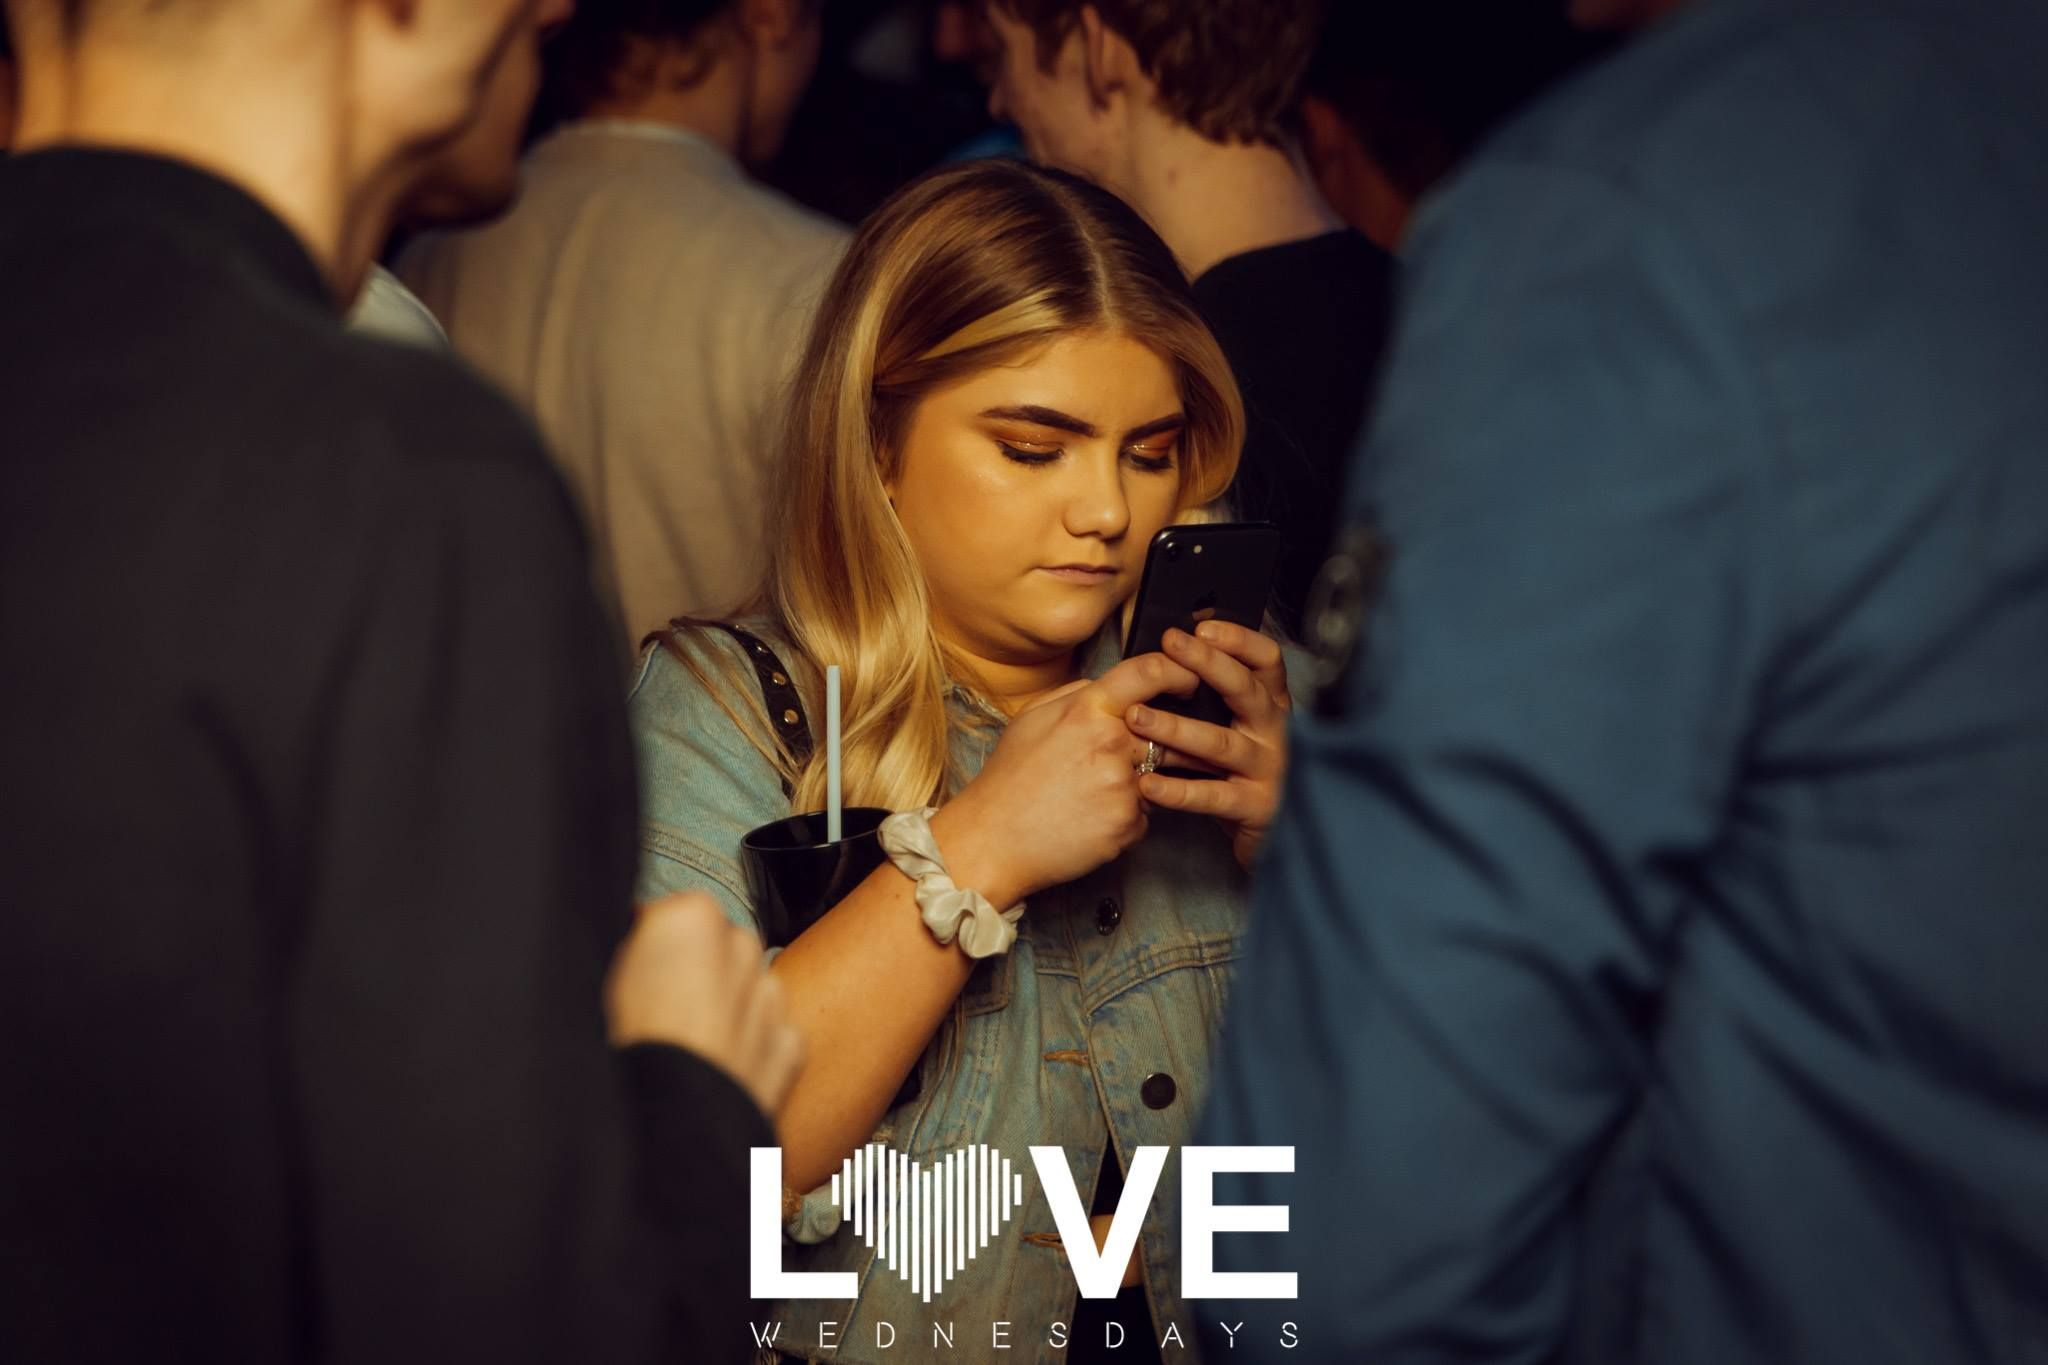 Image may contain: Crowd, Night Club, Club, Pub, Bar Counter, Person, Human